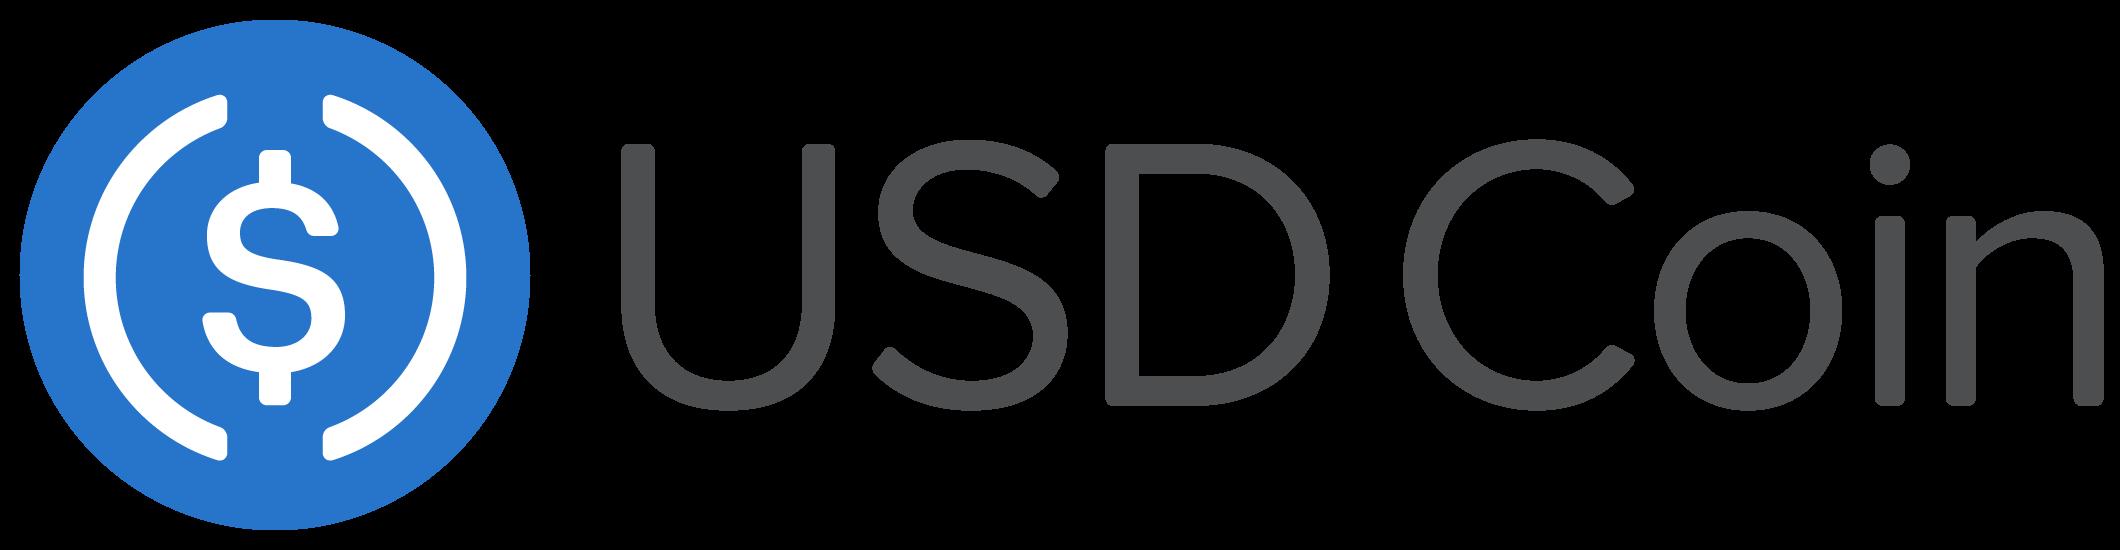 Circle USDC User Agreement – USDC